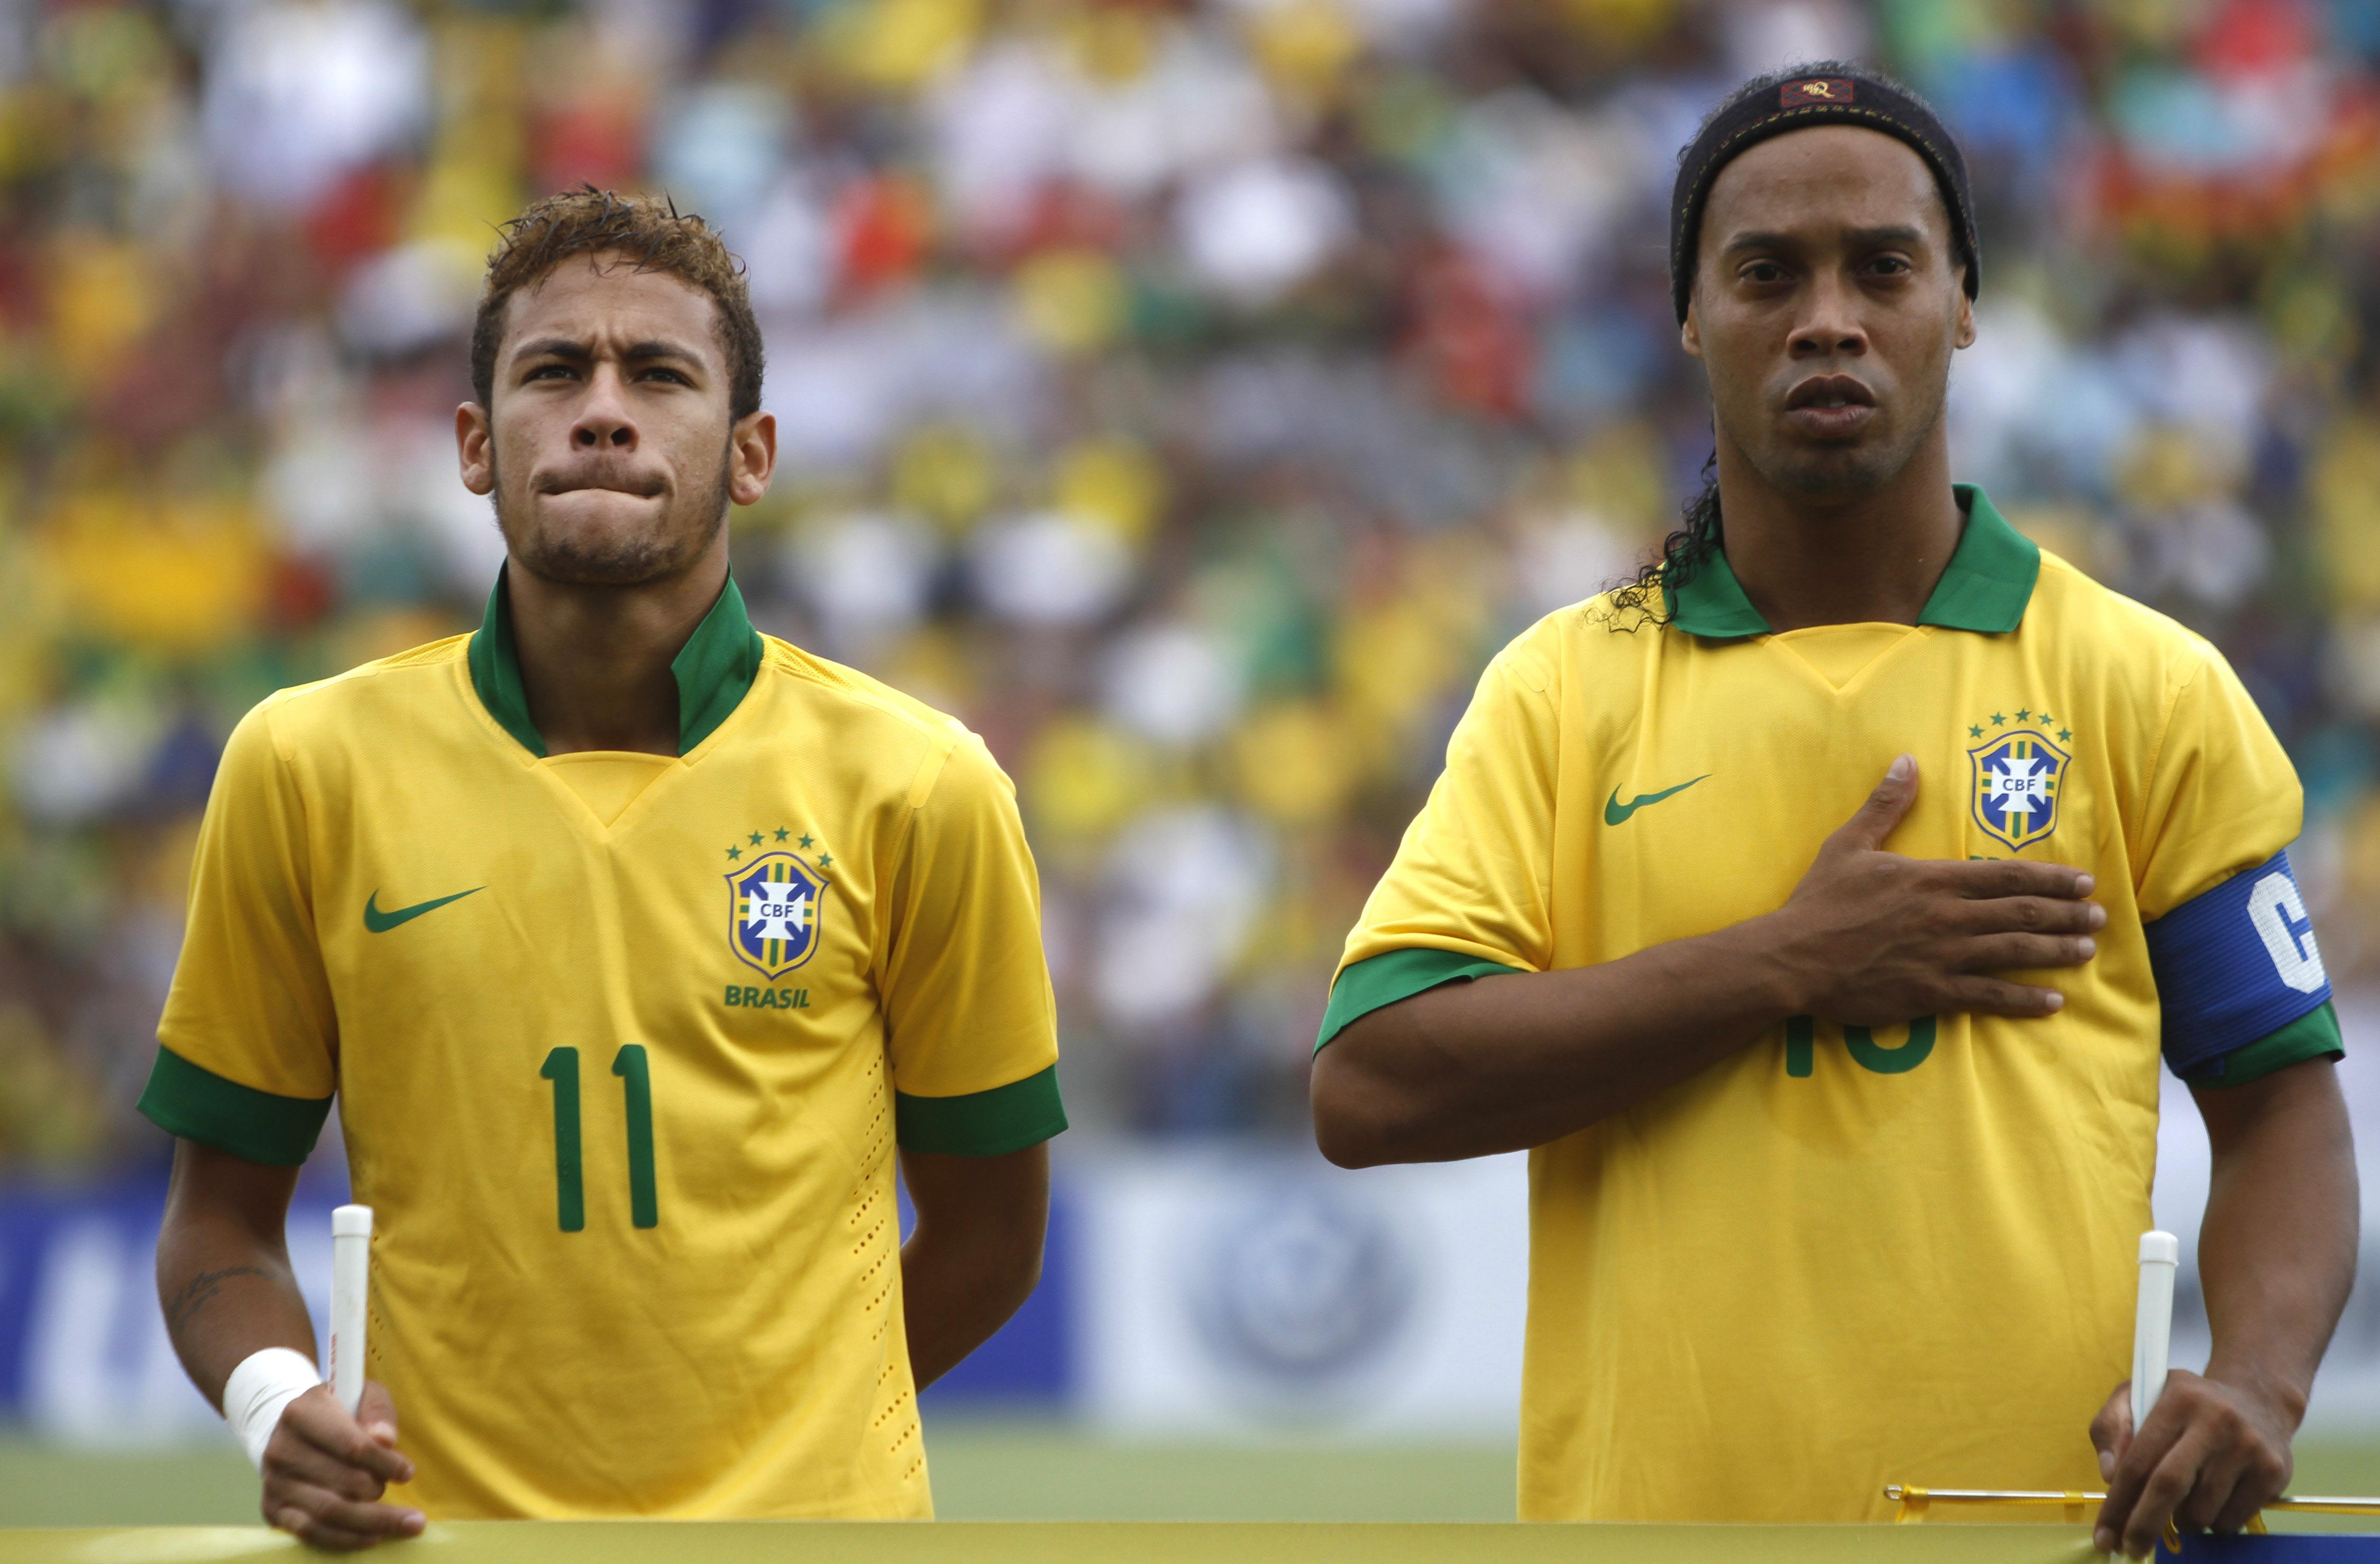 ¿Cuánto mide Ronaldinho? - Altura - Real height A701e37258d9490c08bca59eacc79d72